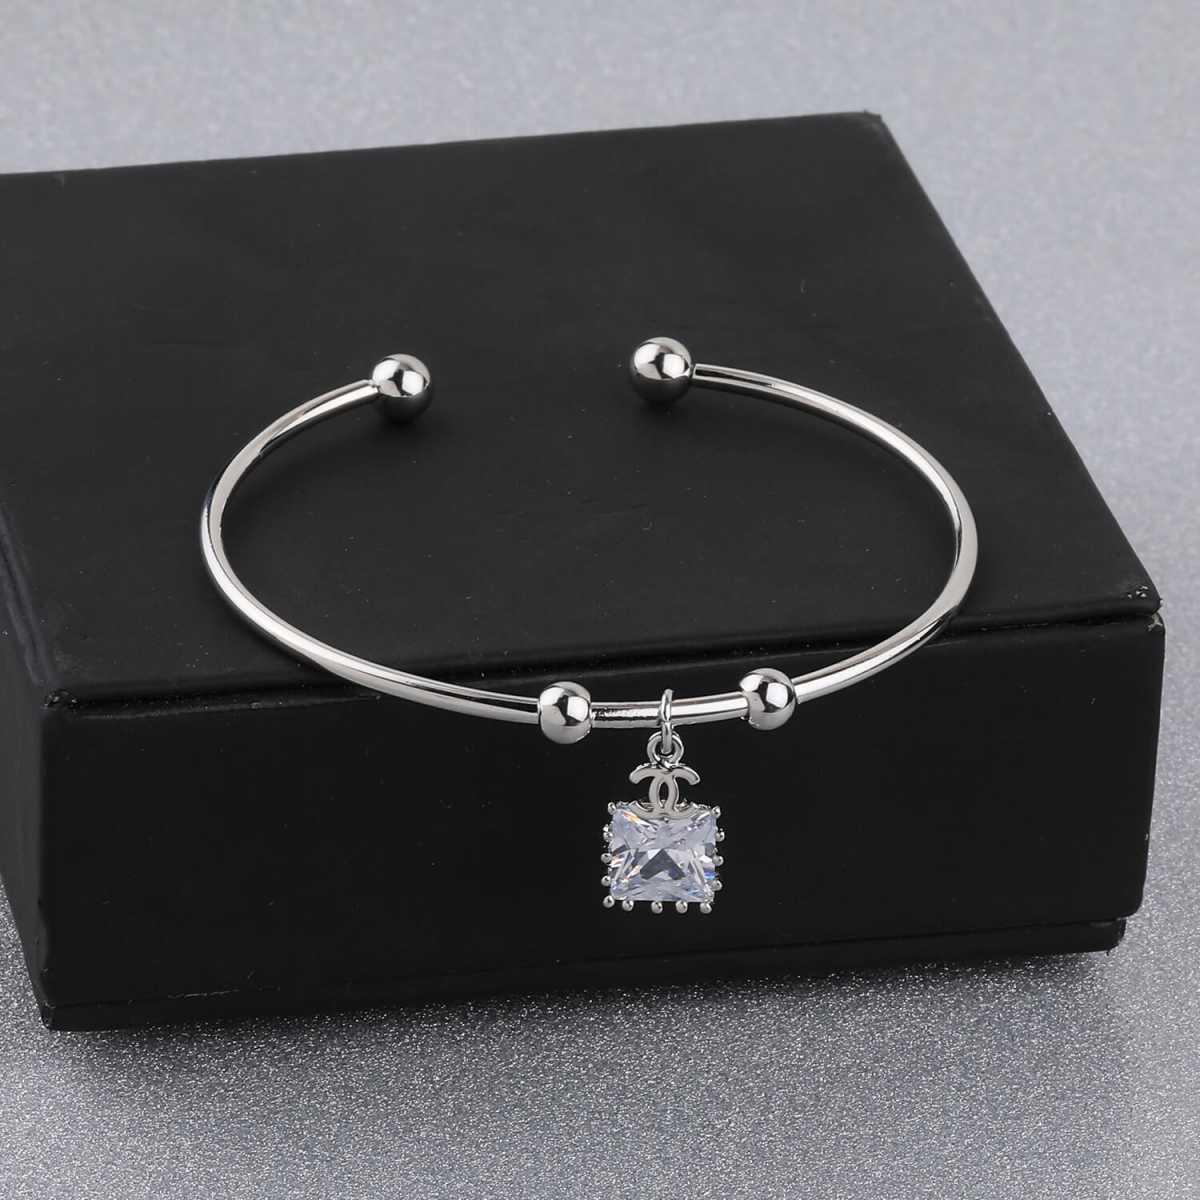 SILVER SHINE Stylish Look Party Wear Adjustable Bracelet With Diamond For Women Girls